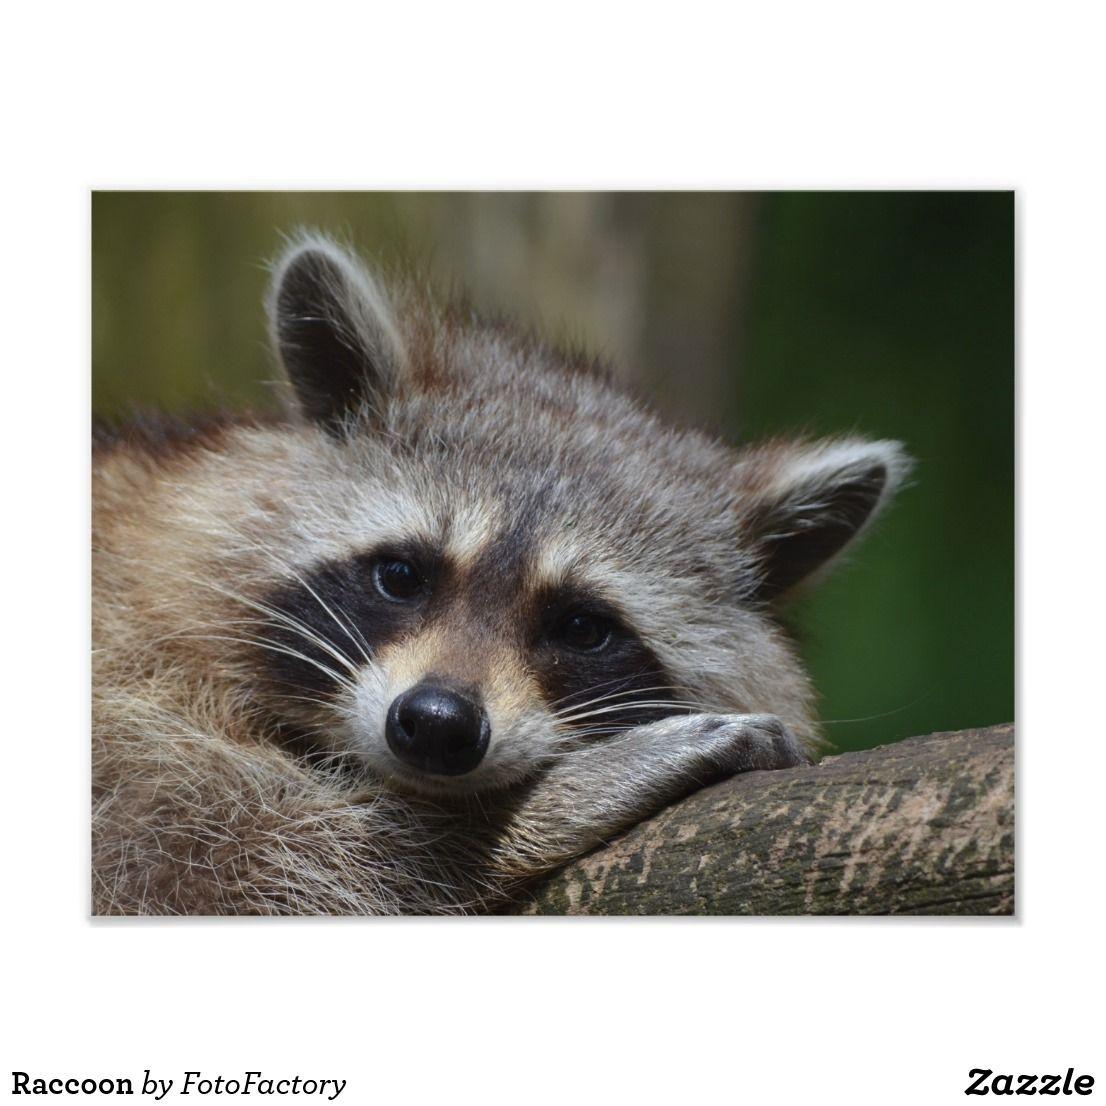 Raccoon Photo Print Zazzle Com Cute Raccoon Cute Animals Animals Beautiful